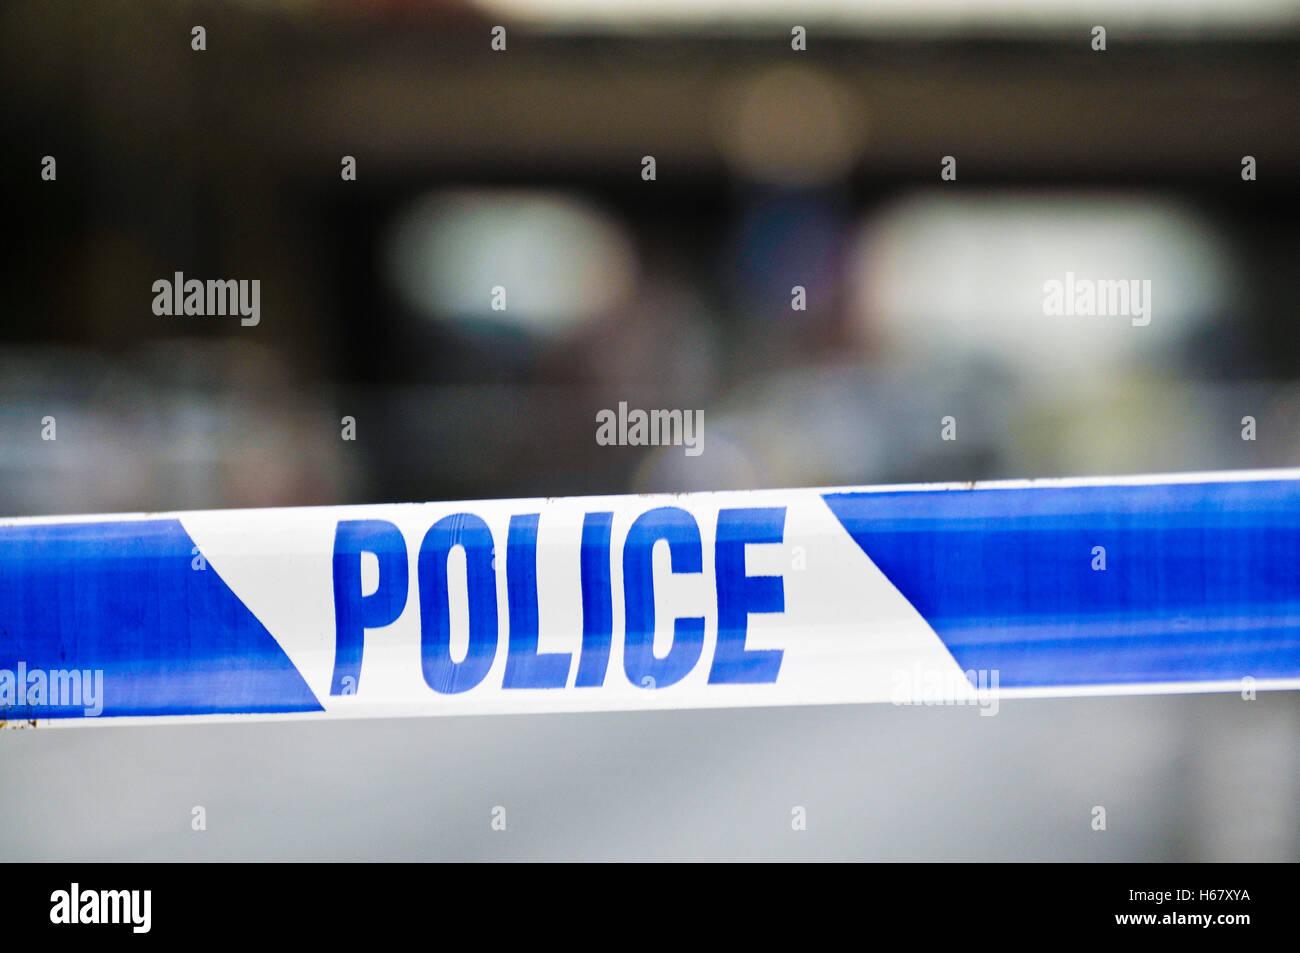 Police tape at the cordon of a crime scene. - Stock Image